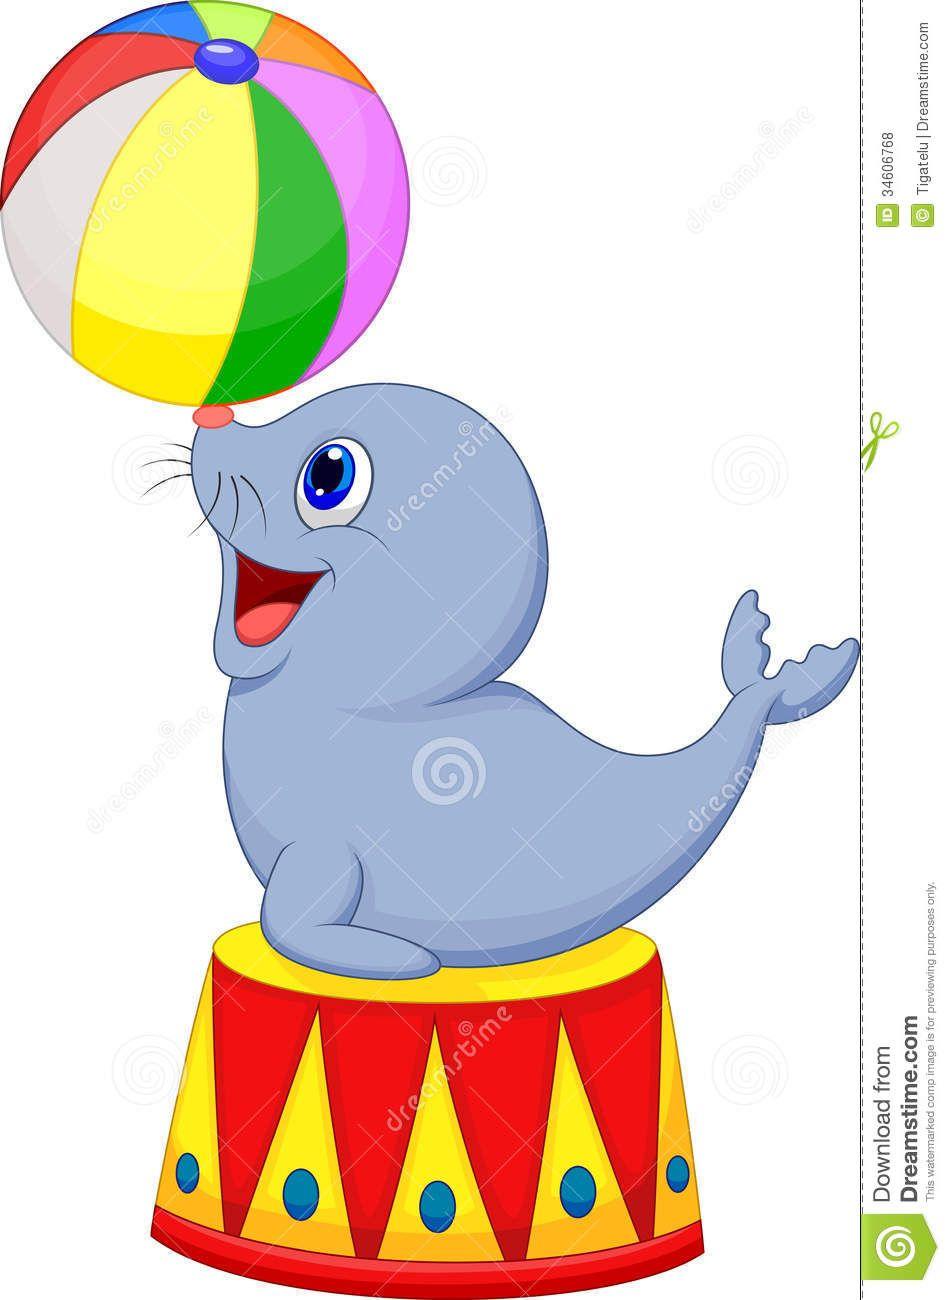 Balls clipart cartoon. Circus seal playing a